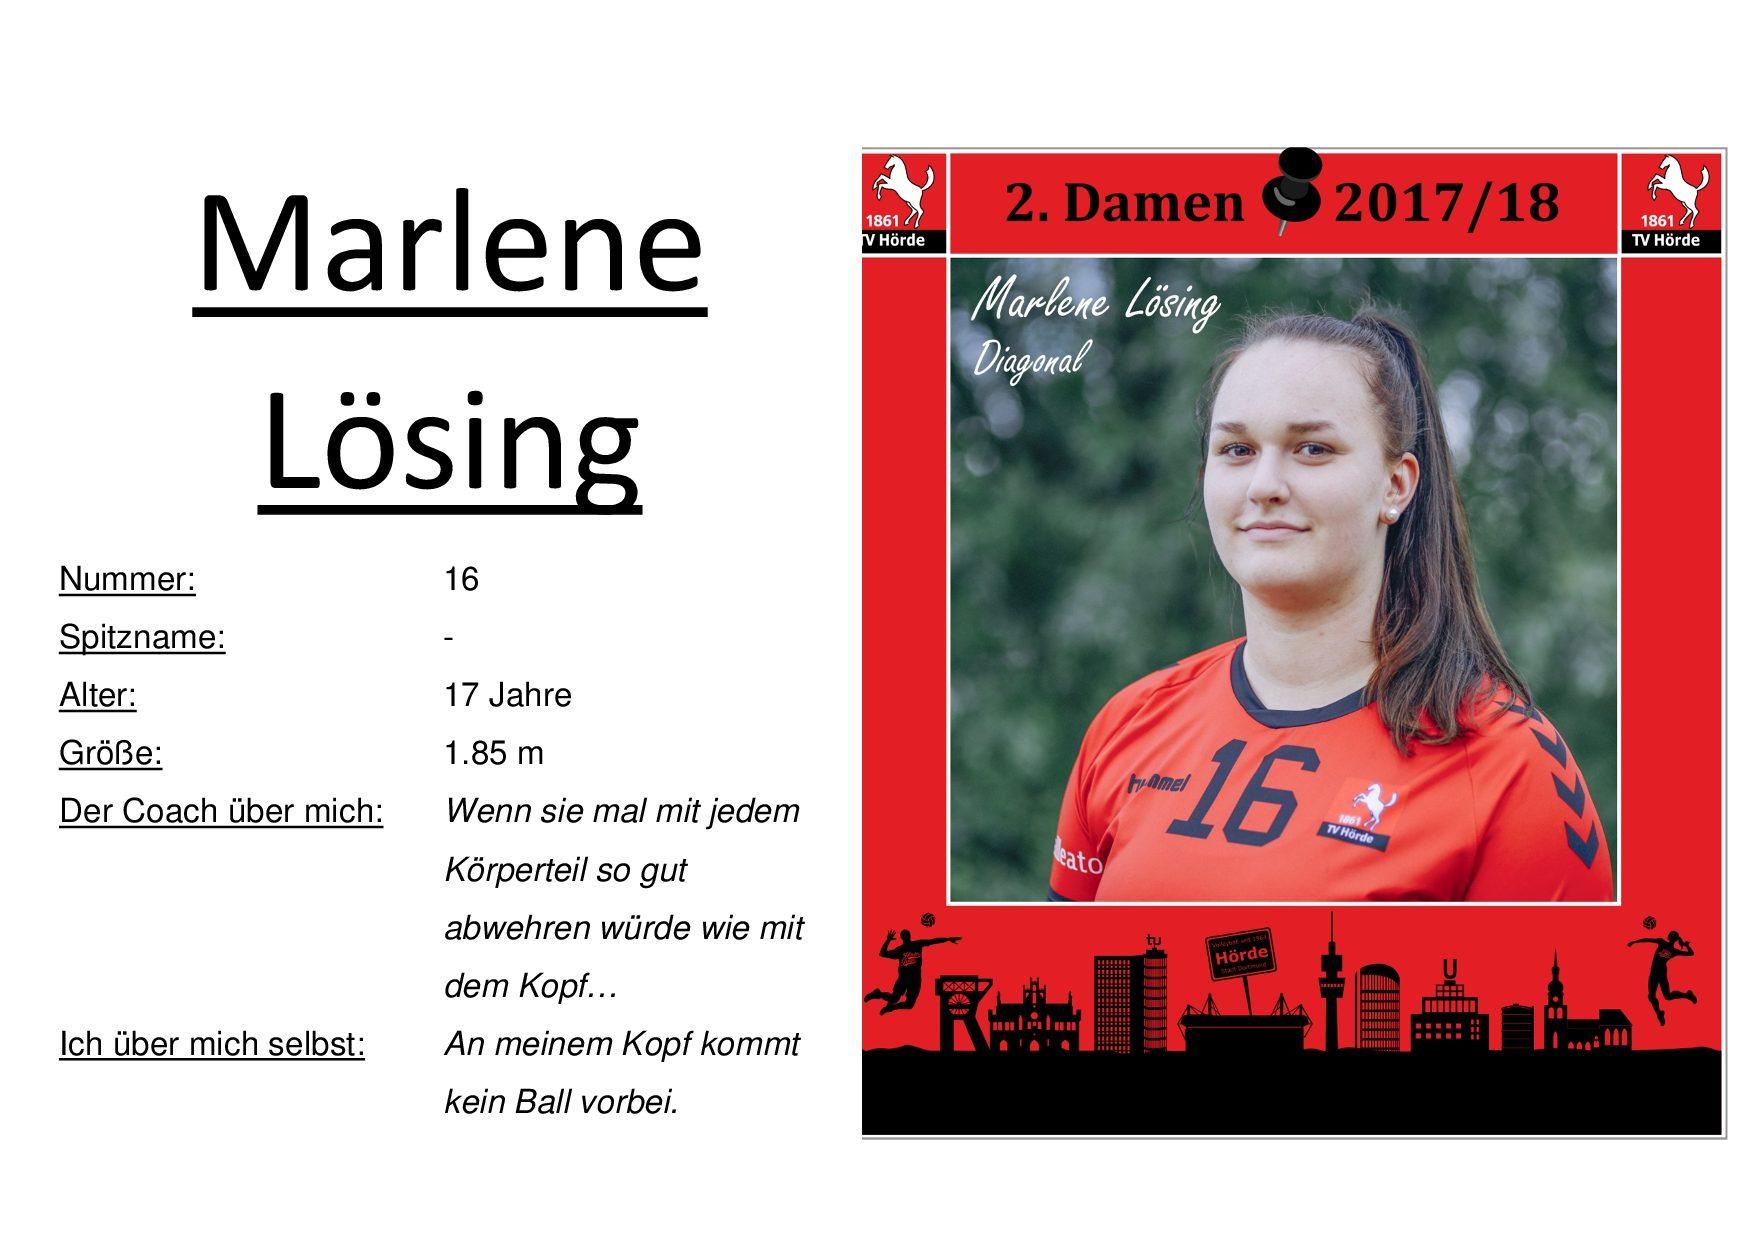 Marlene Lösing